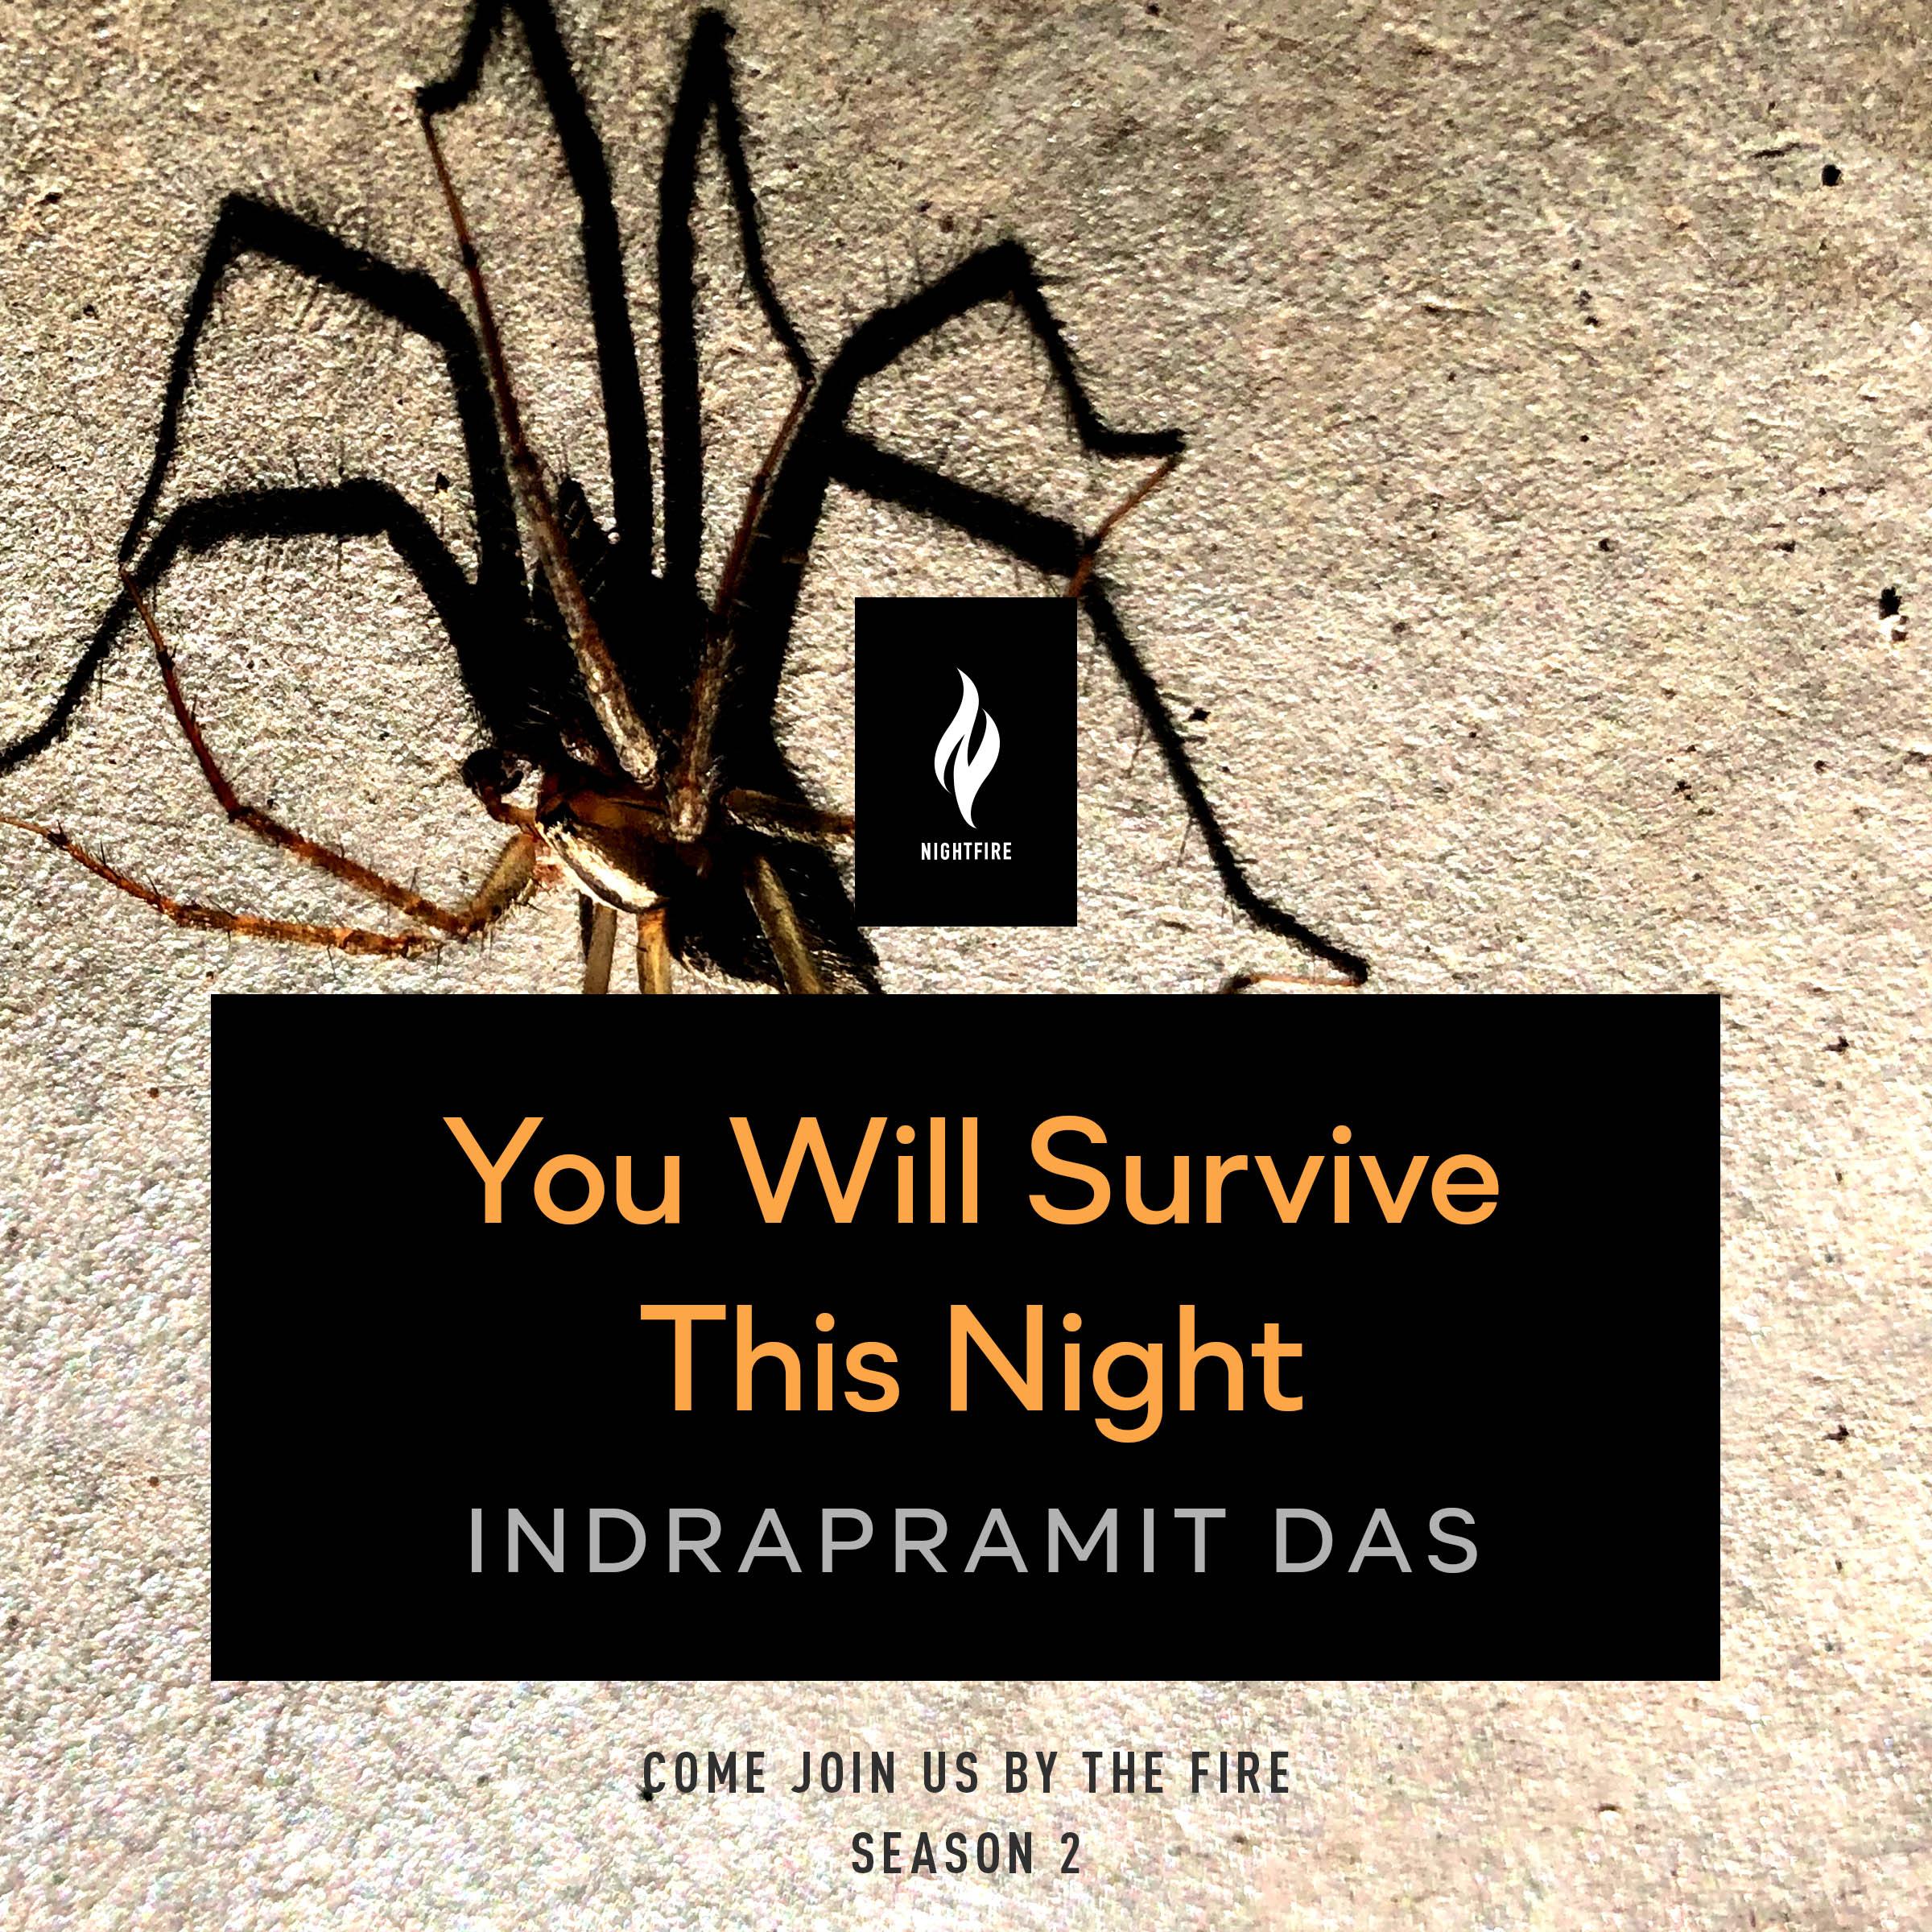 YouWillSurviveThisNight_Das